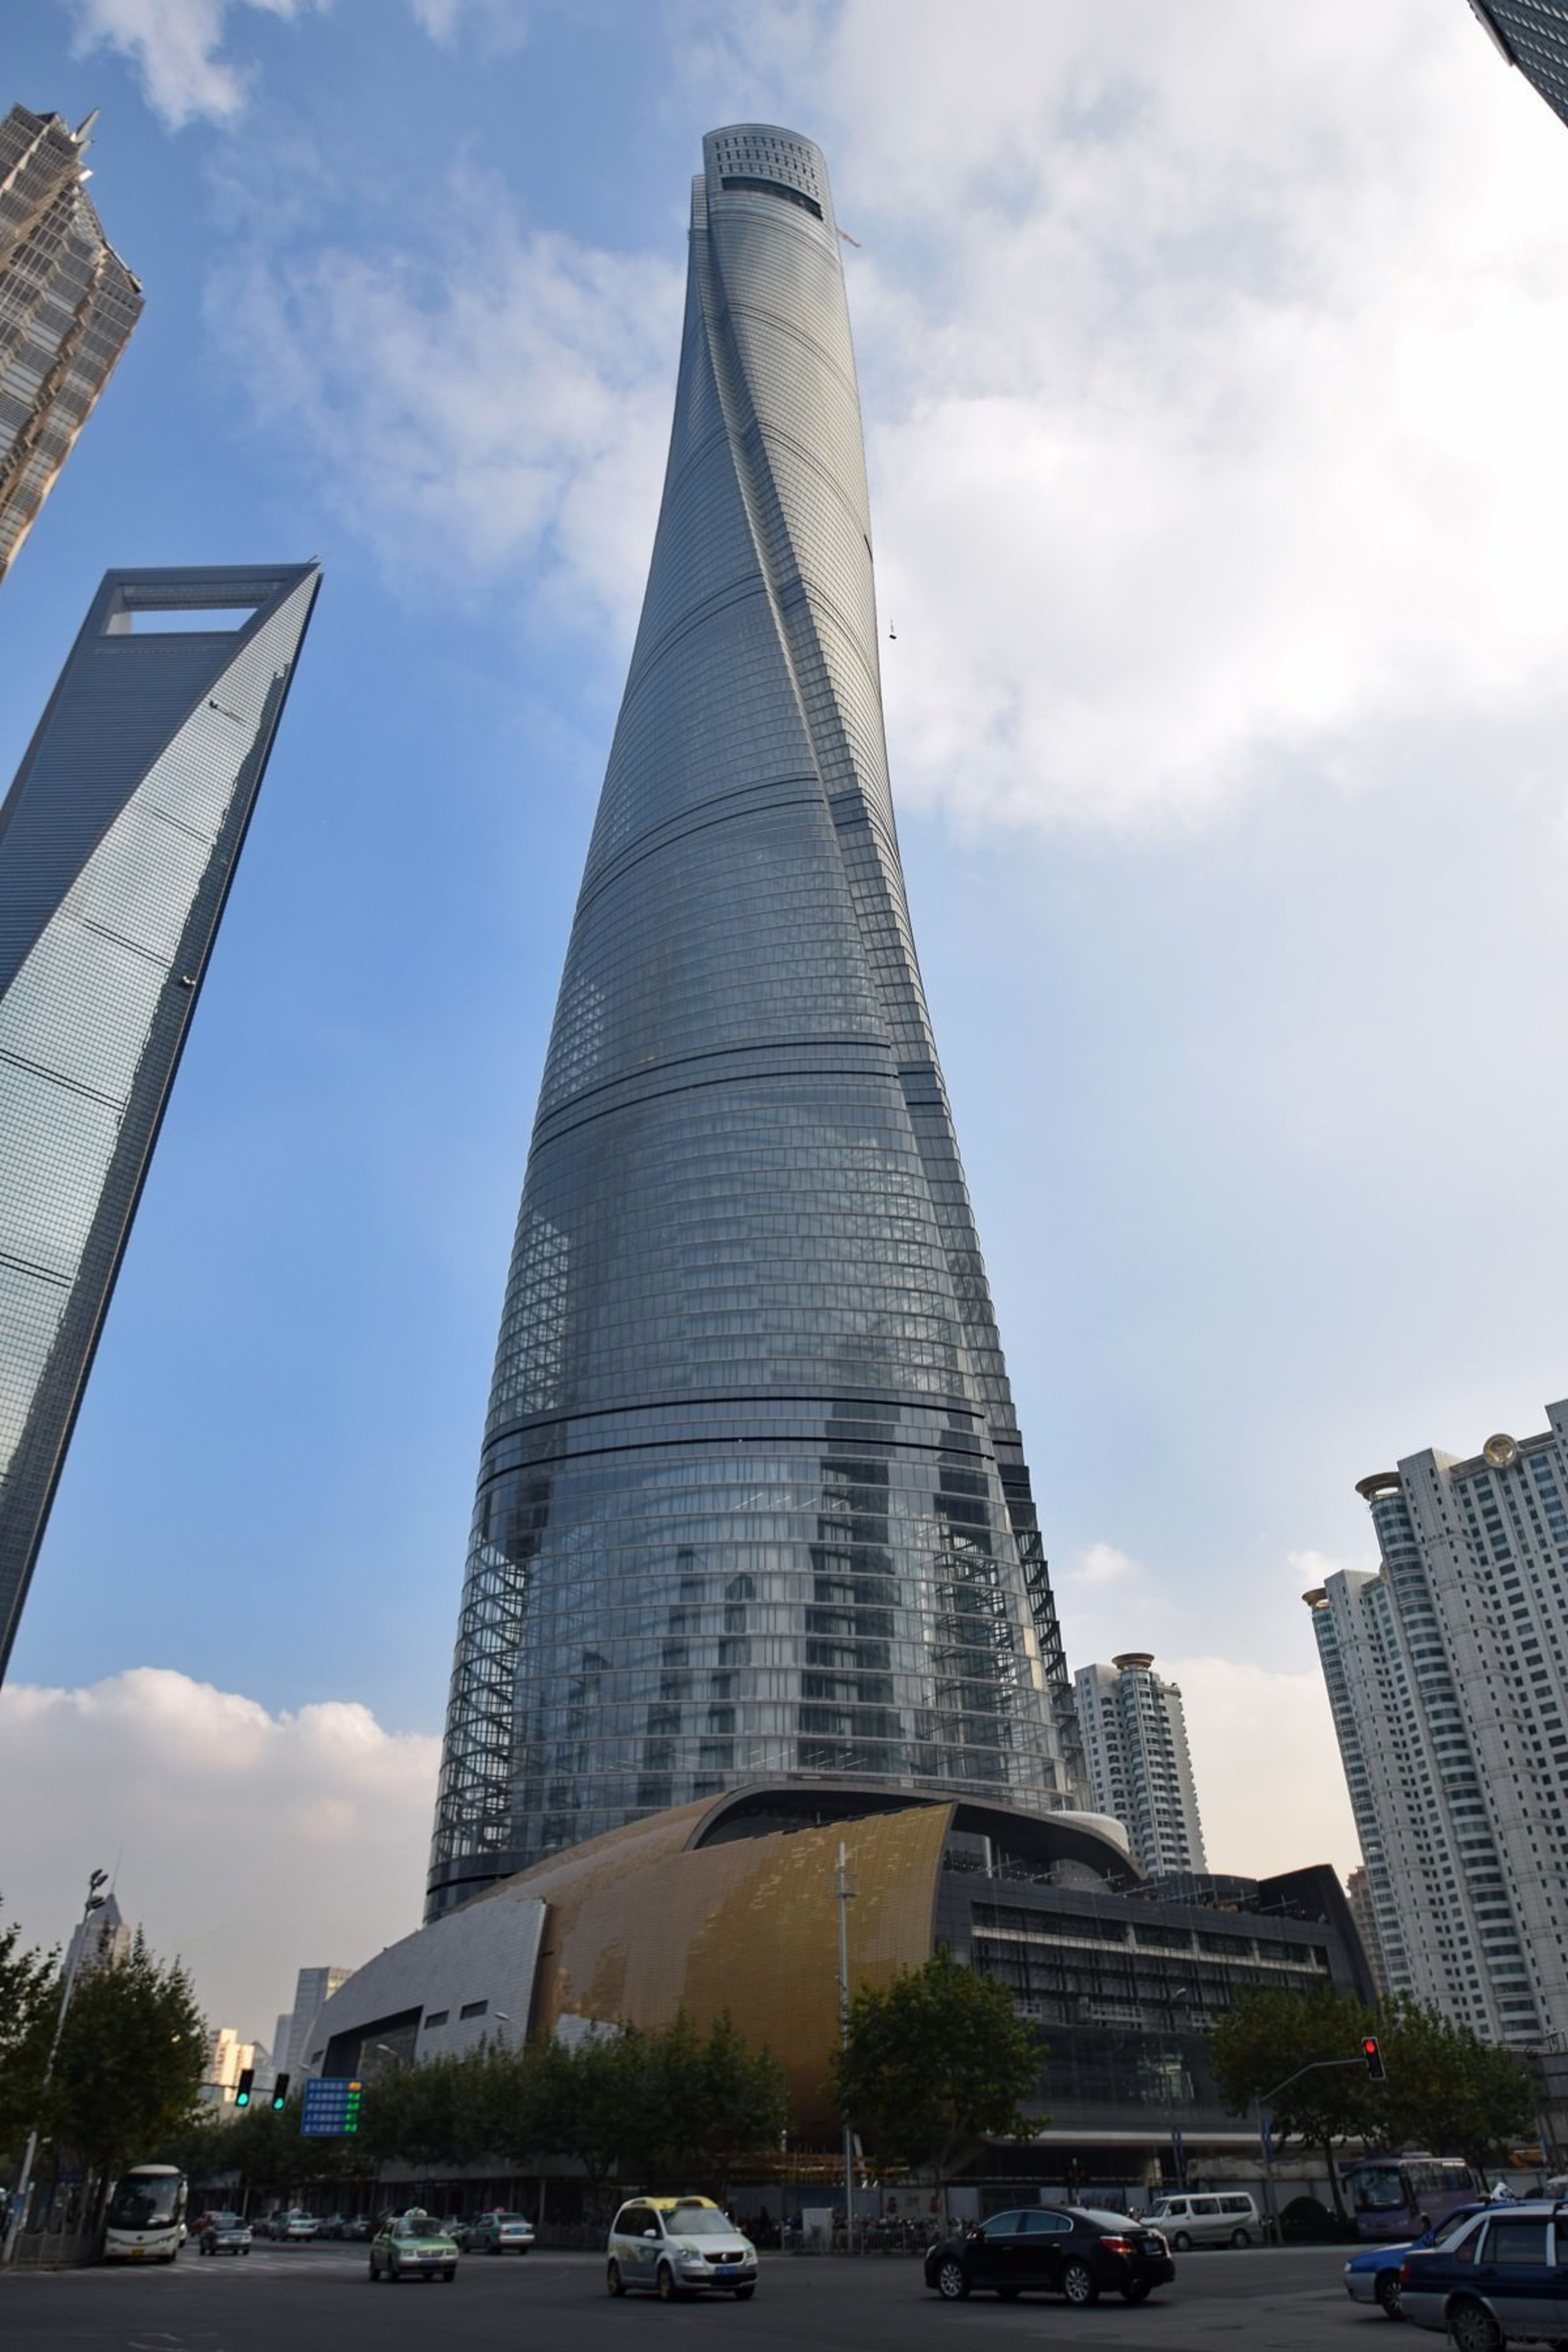 1. Shanghai Tower – 632 m (2,073 ft) architecture, building, city, condominium, corporate headquarters, daytime, headquarters, landmark, metropolis, metropolitan area, sky, skyscraper, tower, tower block, urban area, white